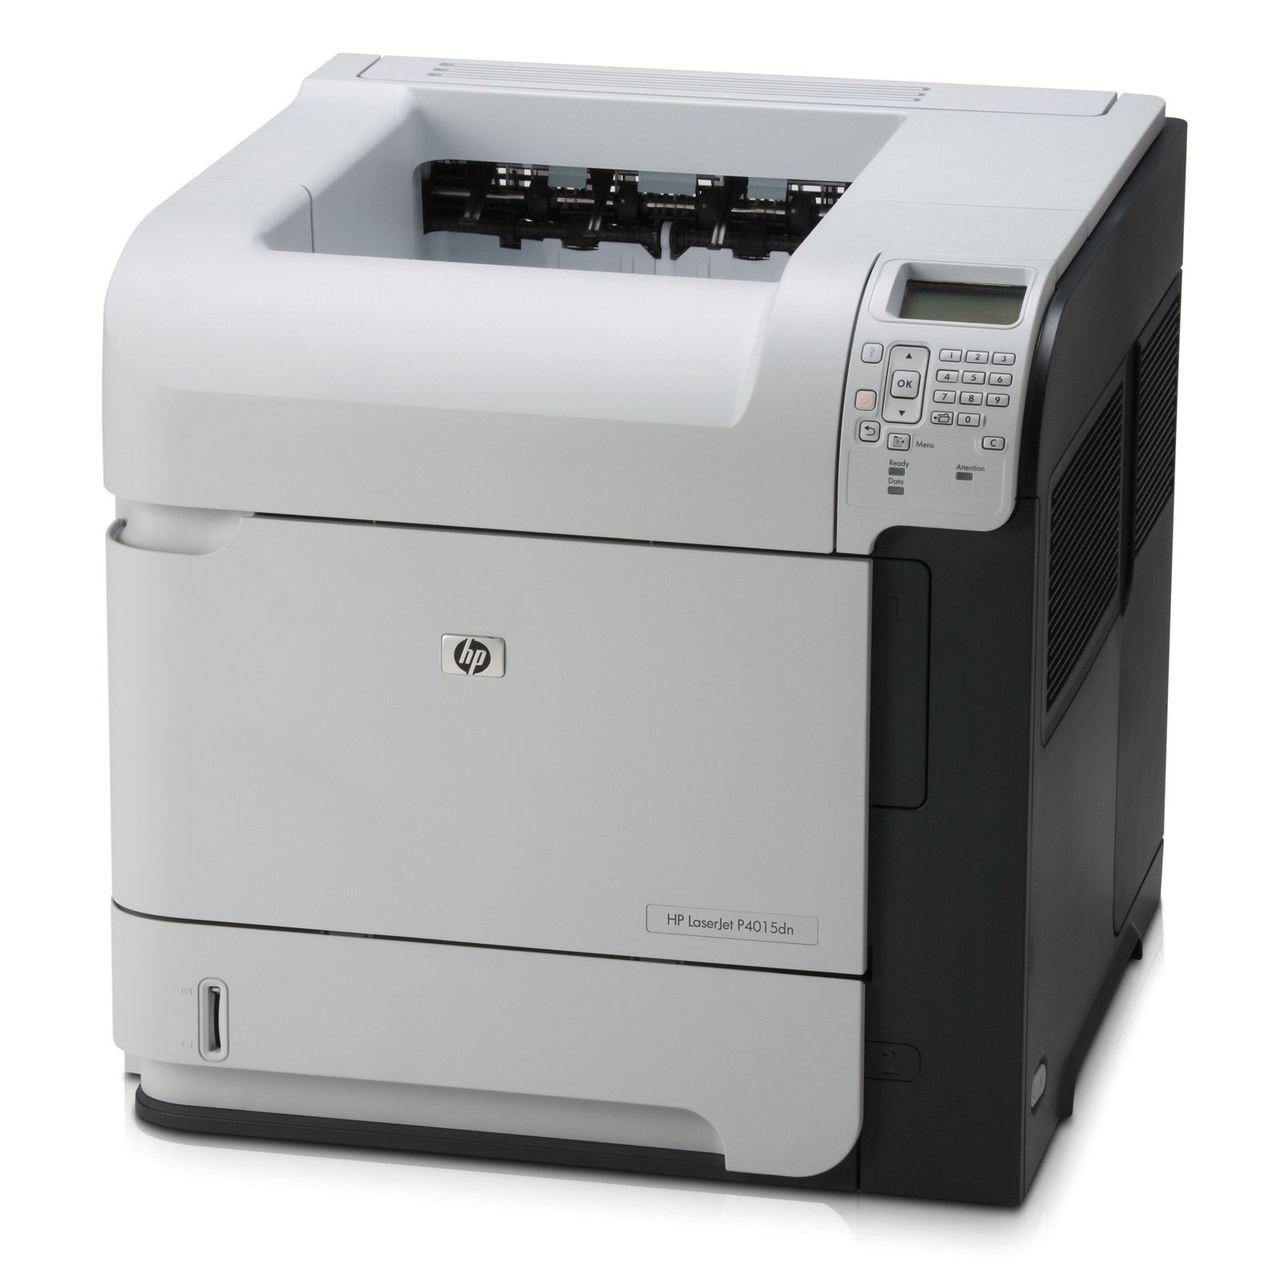 HP LaserJet P4015dn - CB526A - HP Laser Printer for sale